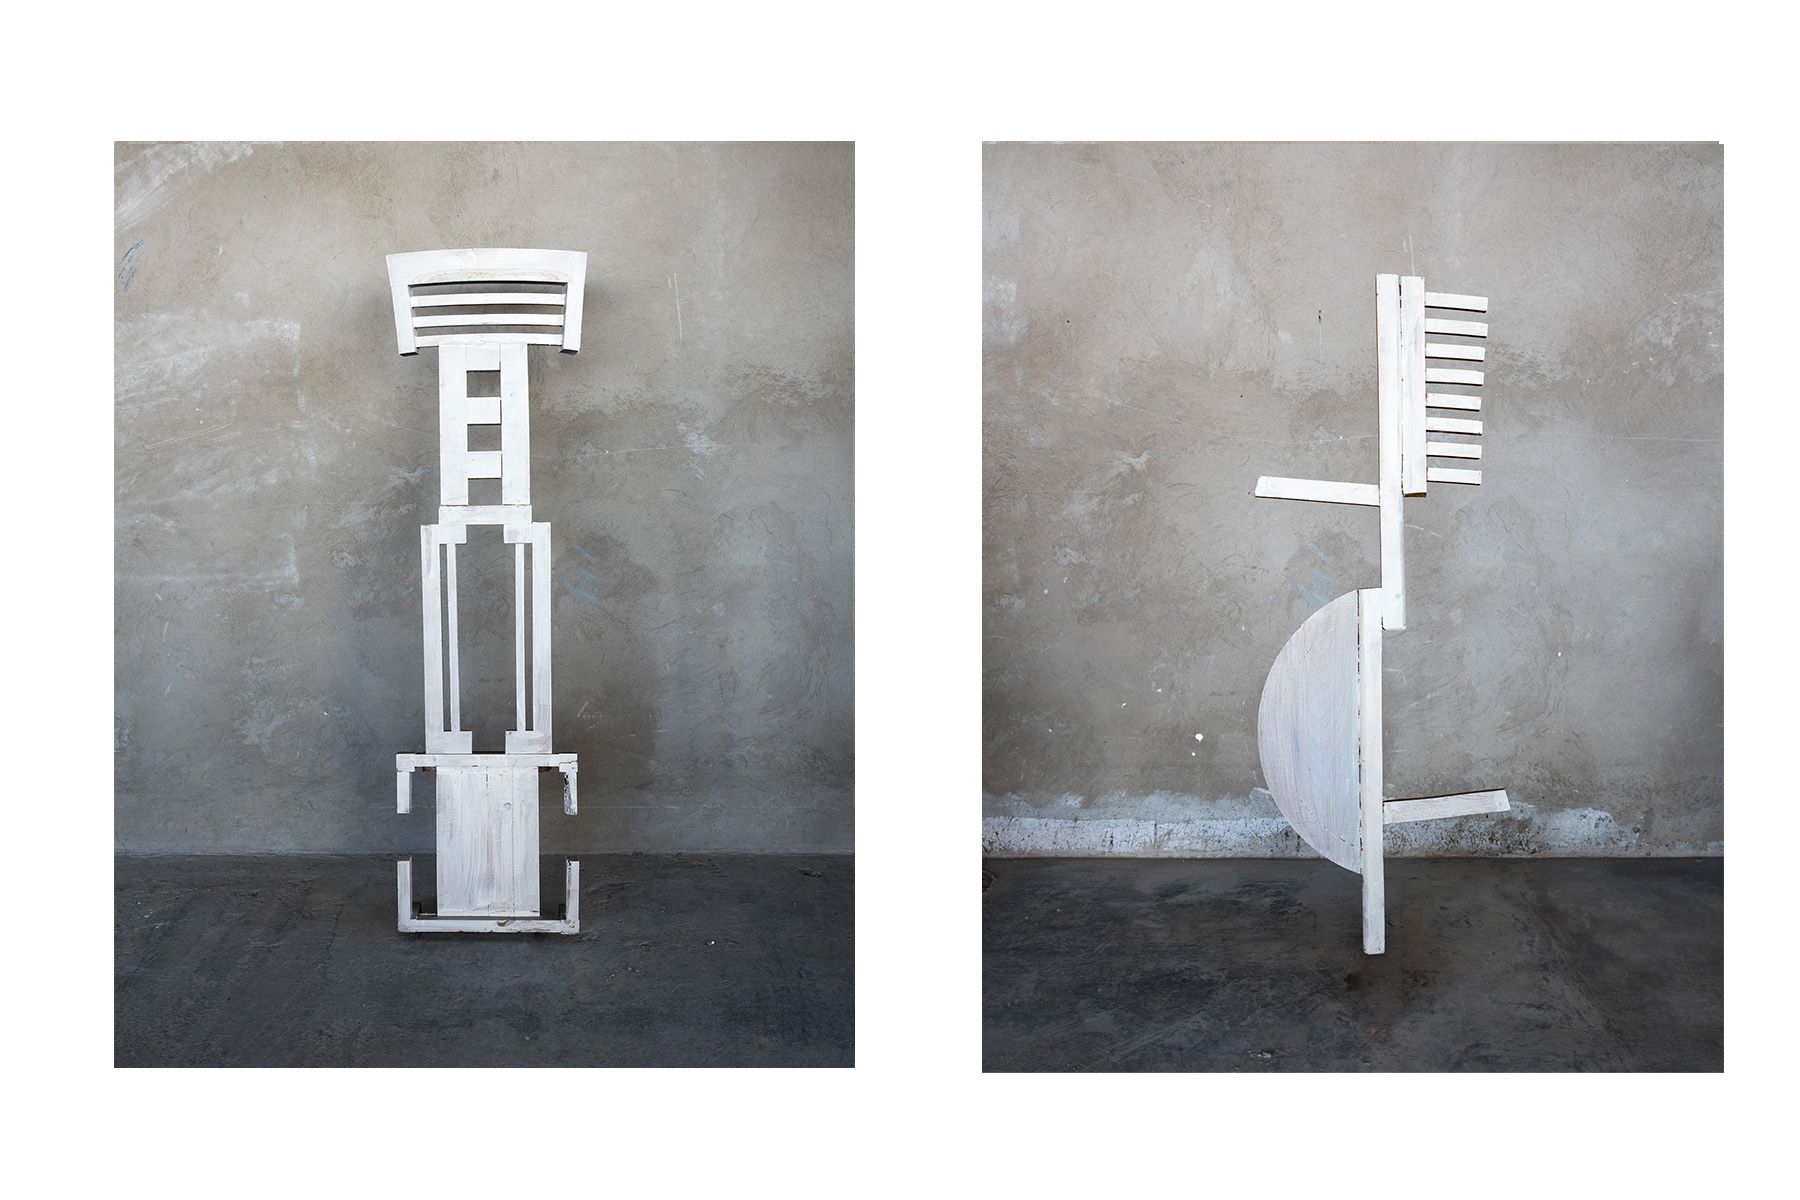 Furniture Totem (#7 left, #9, right)